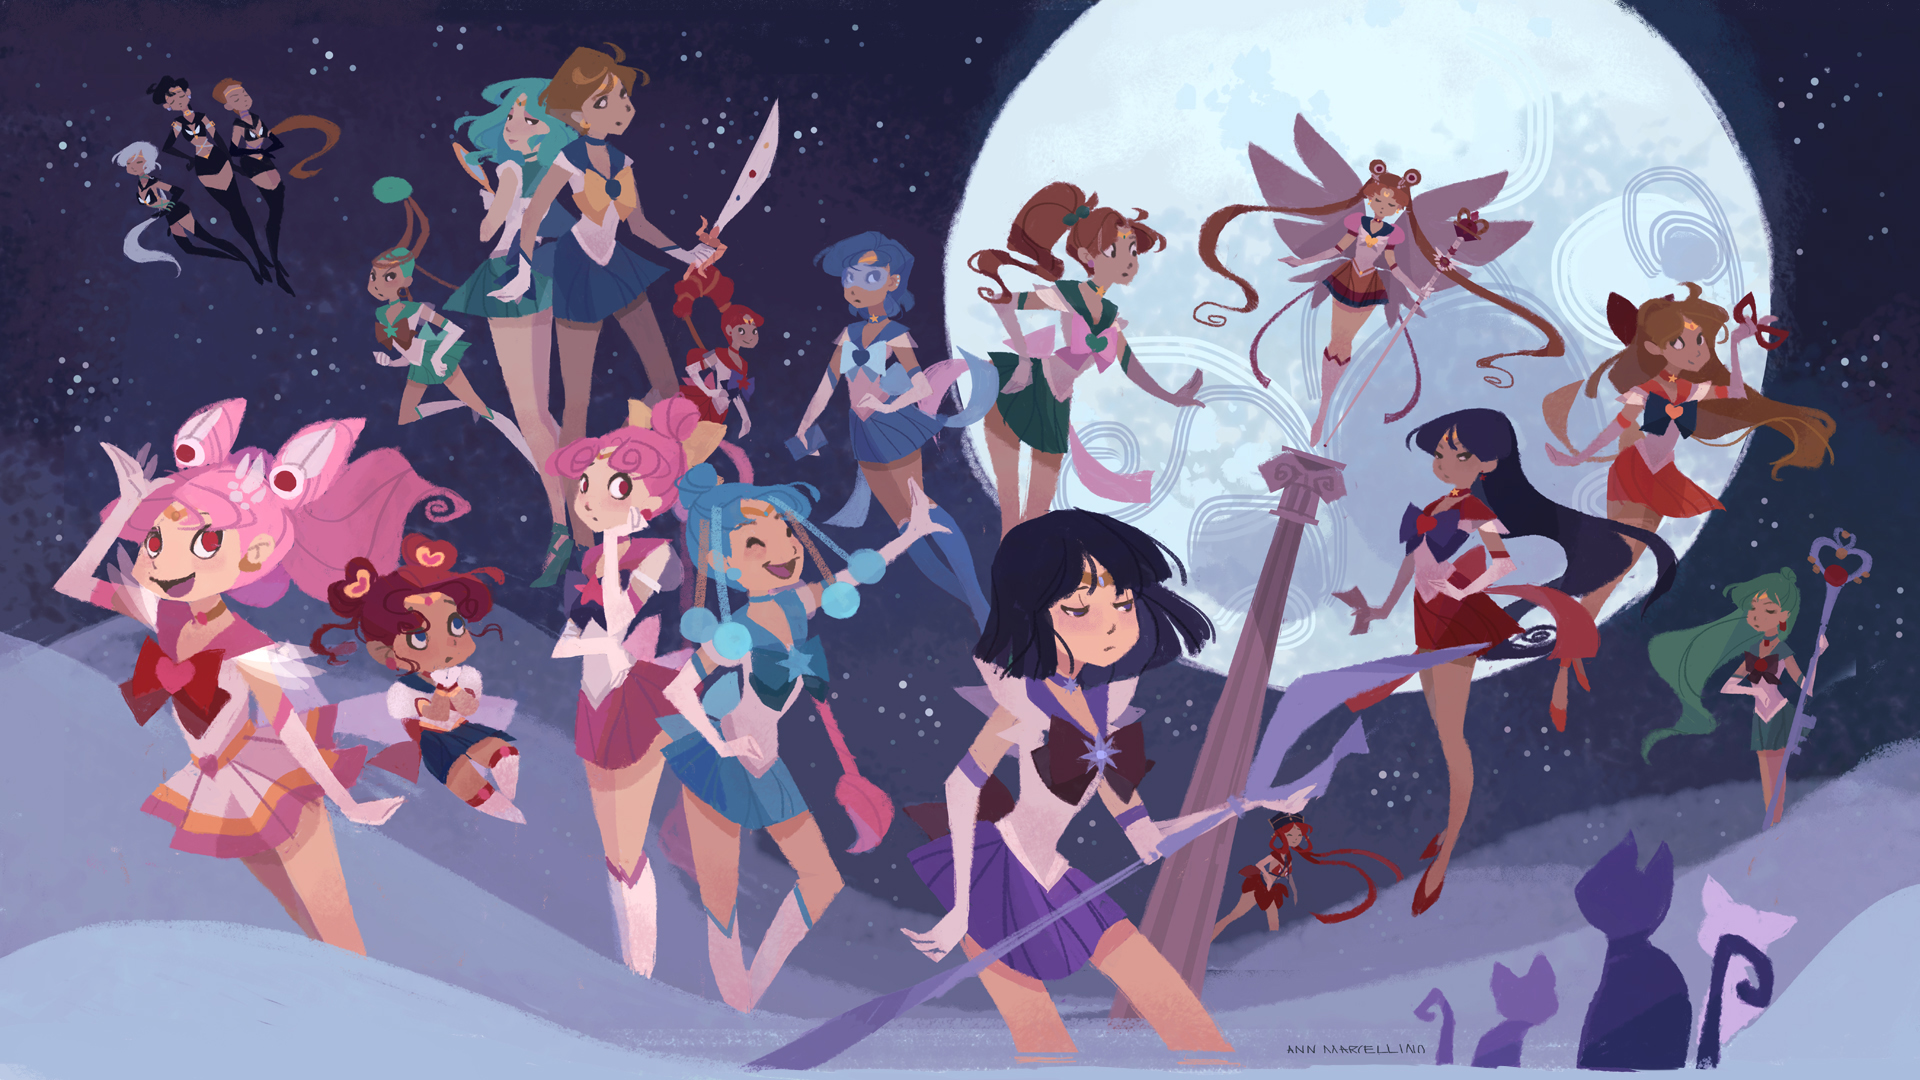 sailor moon wallpaper fanart - photo #33